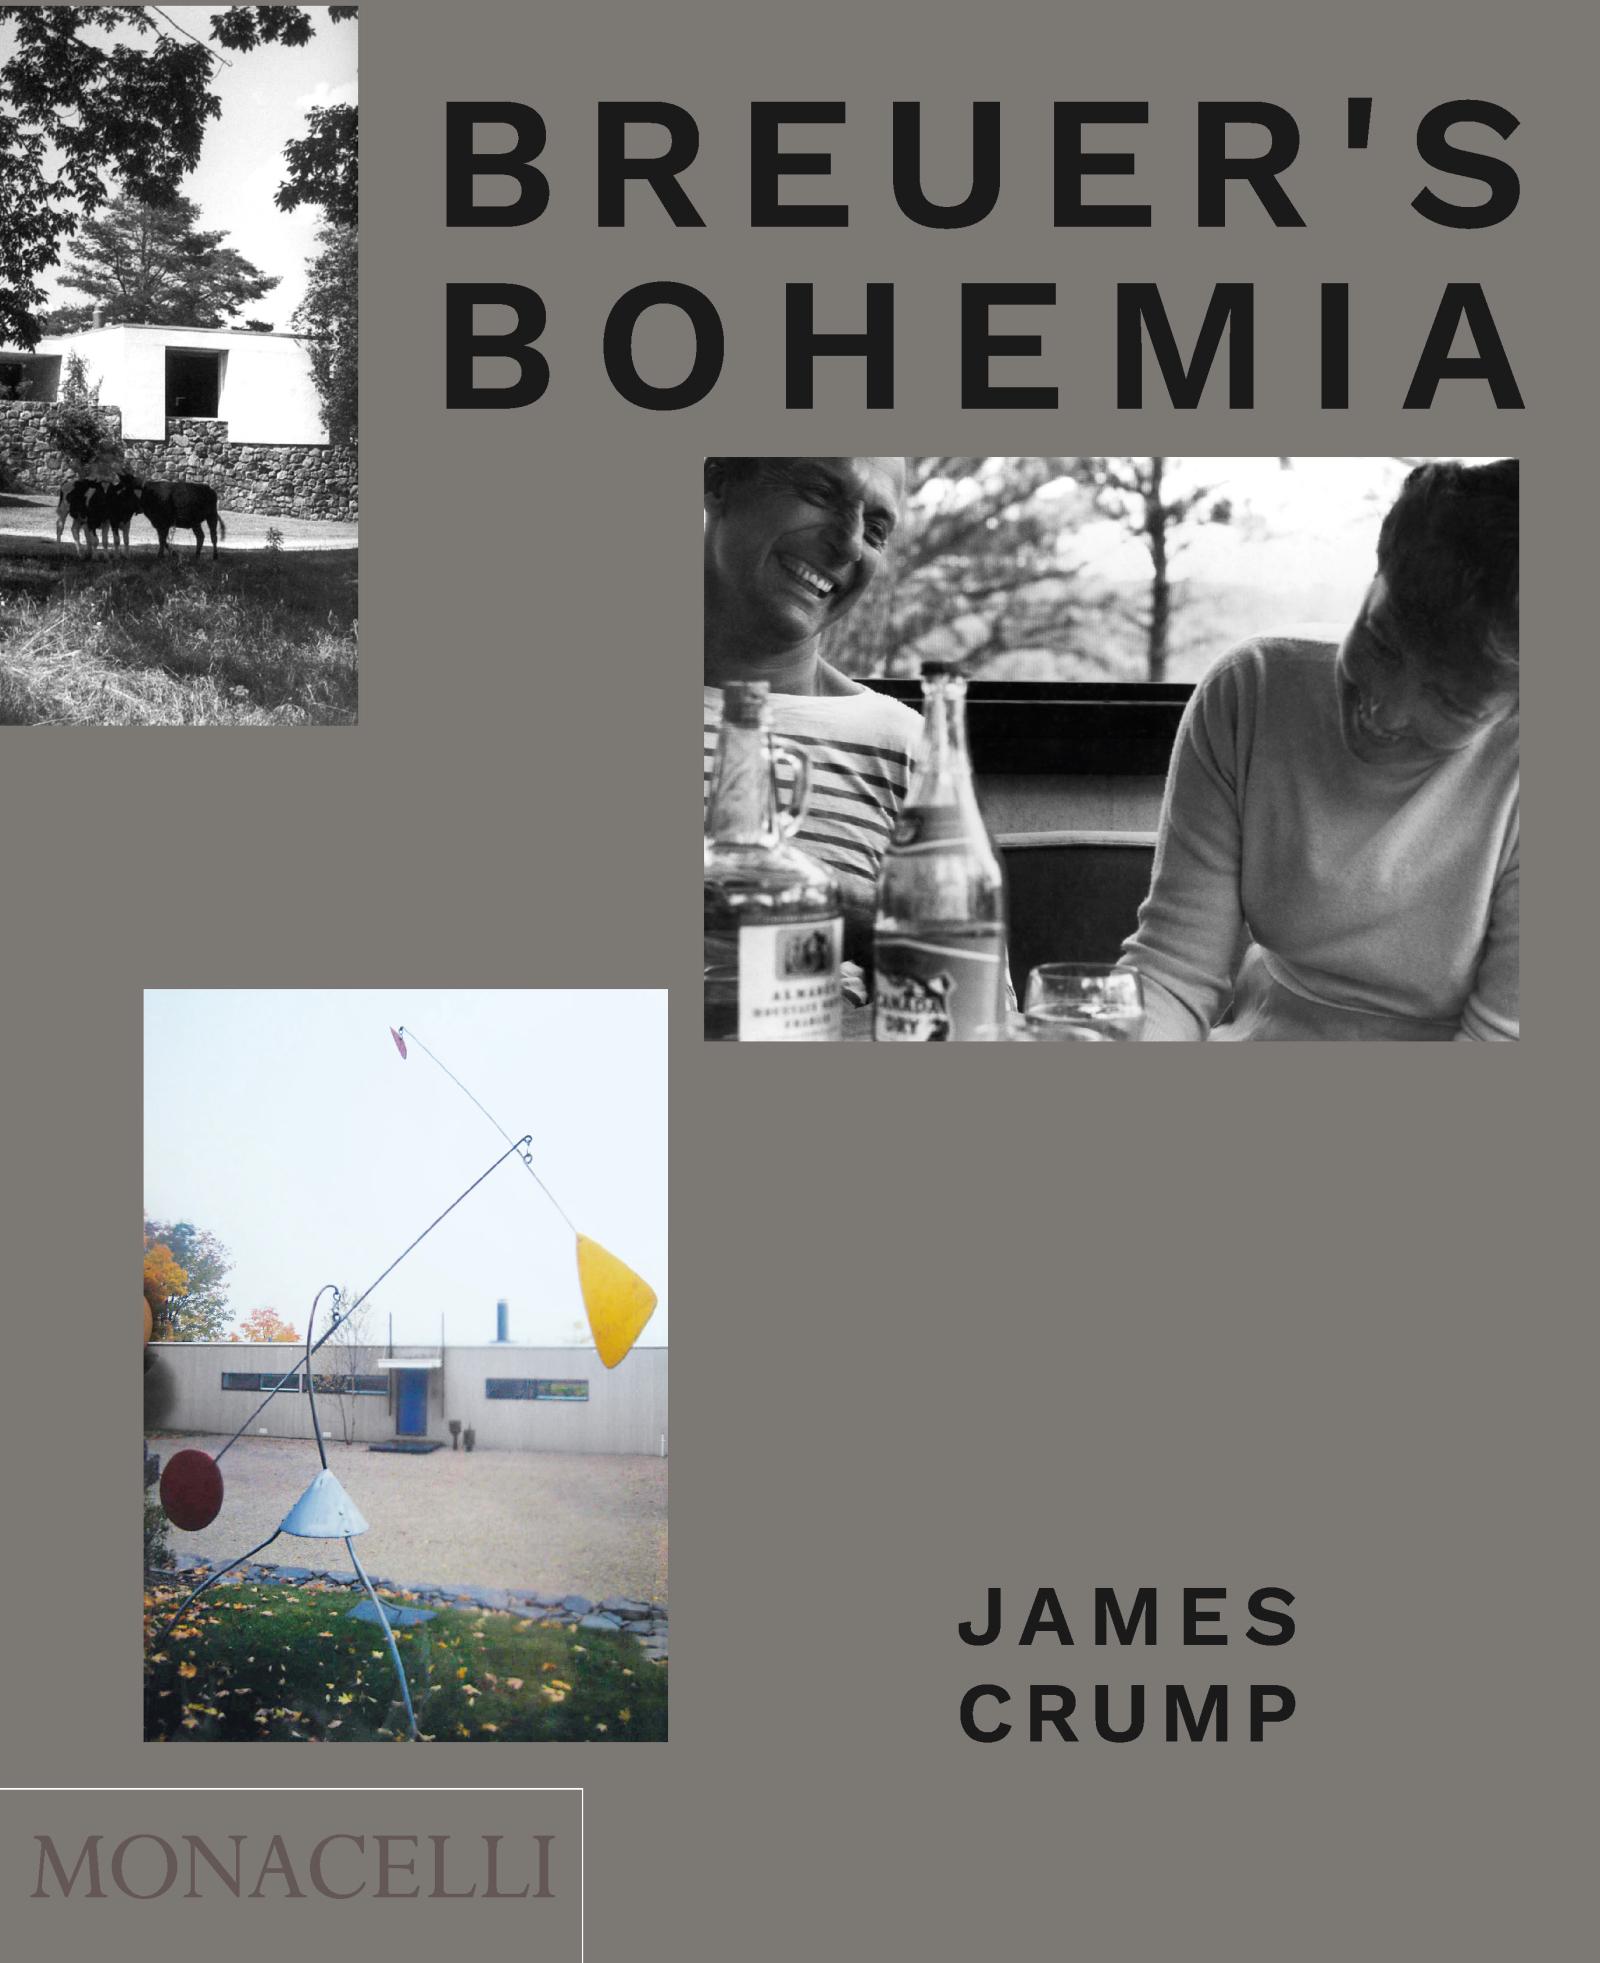 breuers bohemia book cover